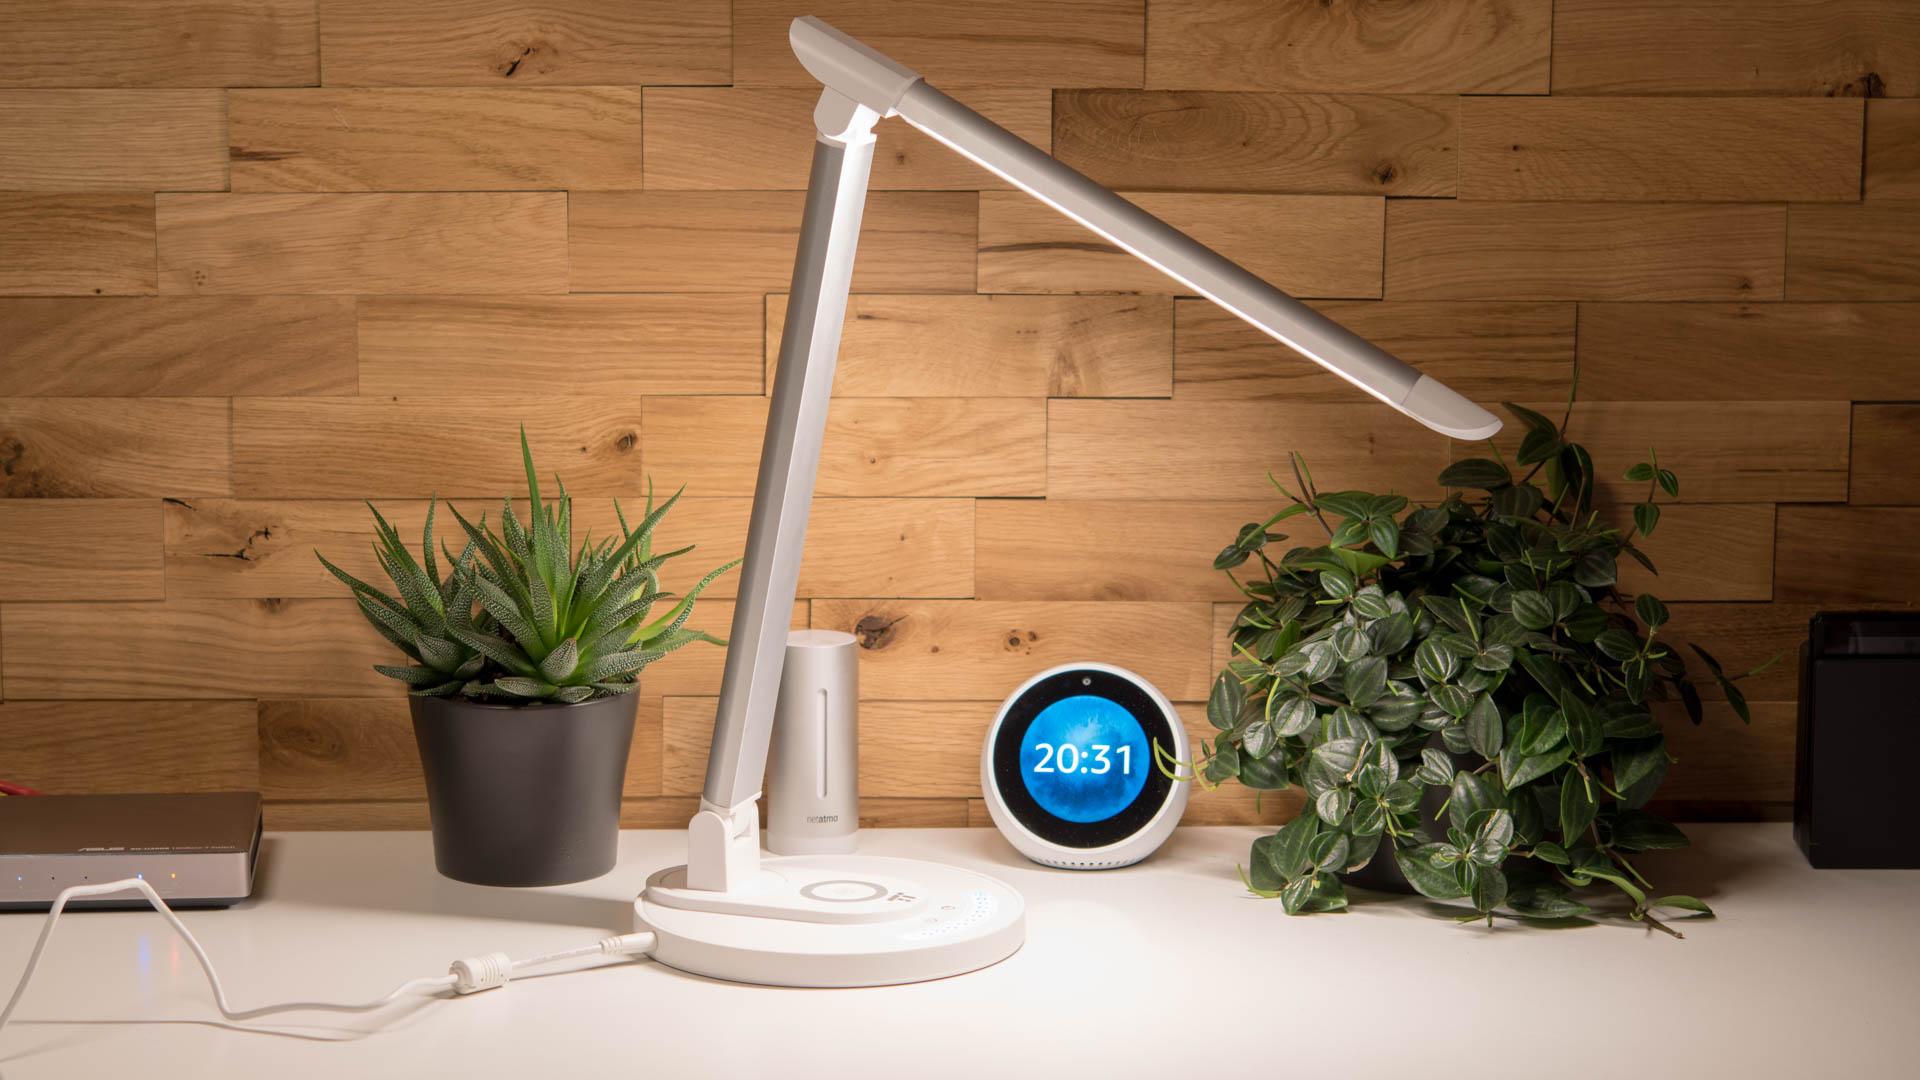 die taotronics tt dl036 tischlampe mit kabelloser ladestation im test techtest. Black Bedroom Furniture Sets. Home Design Ideas